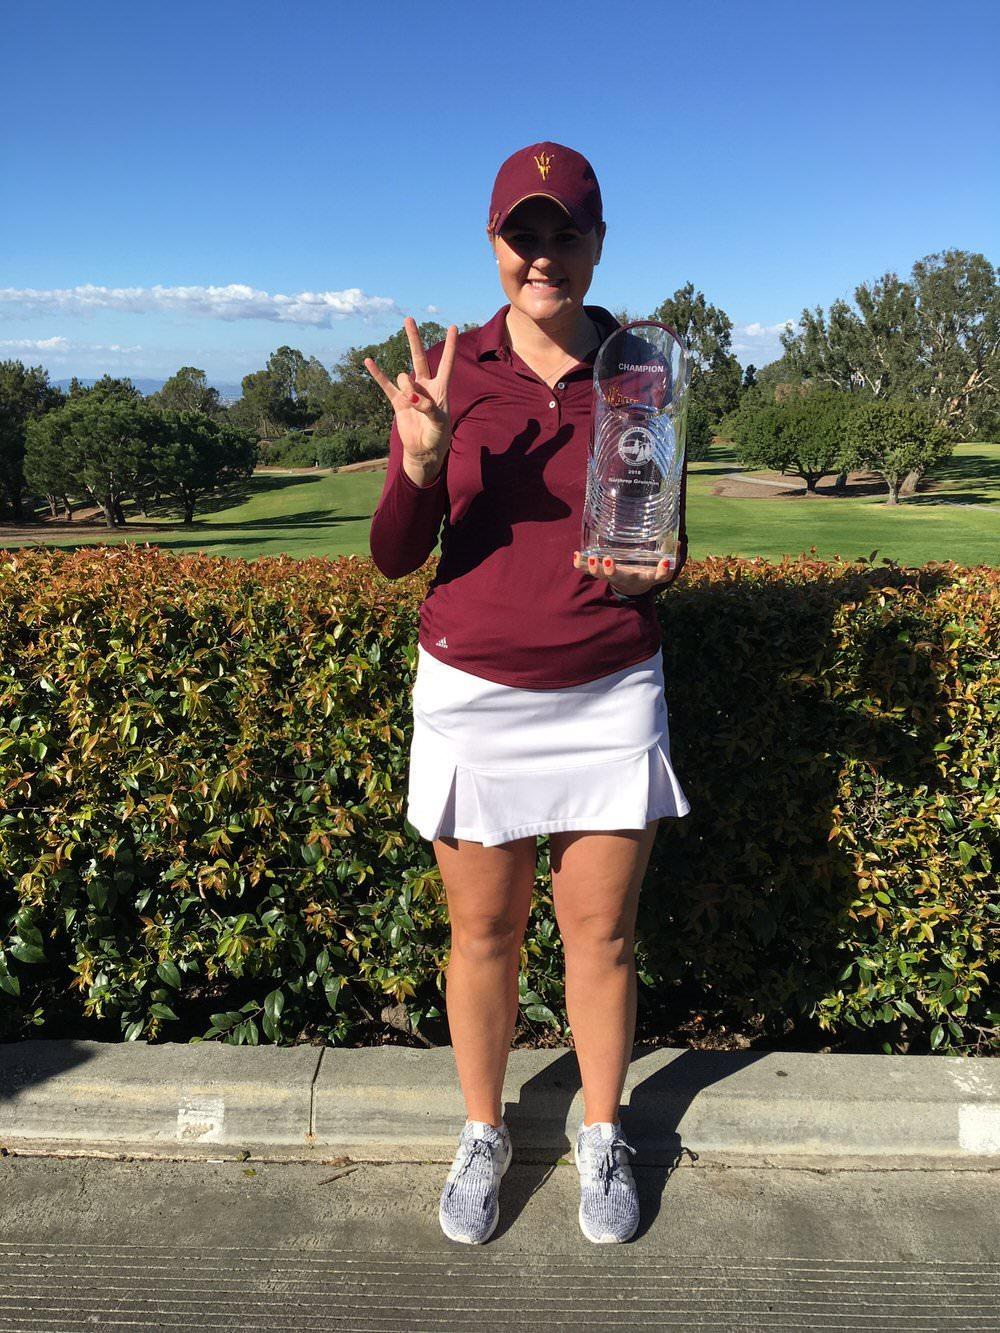 Olivia Mehaffey following her maiden US collegiate win in the